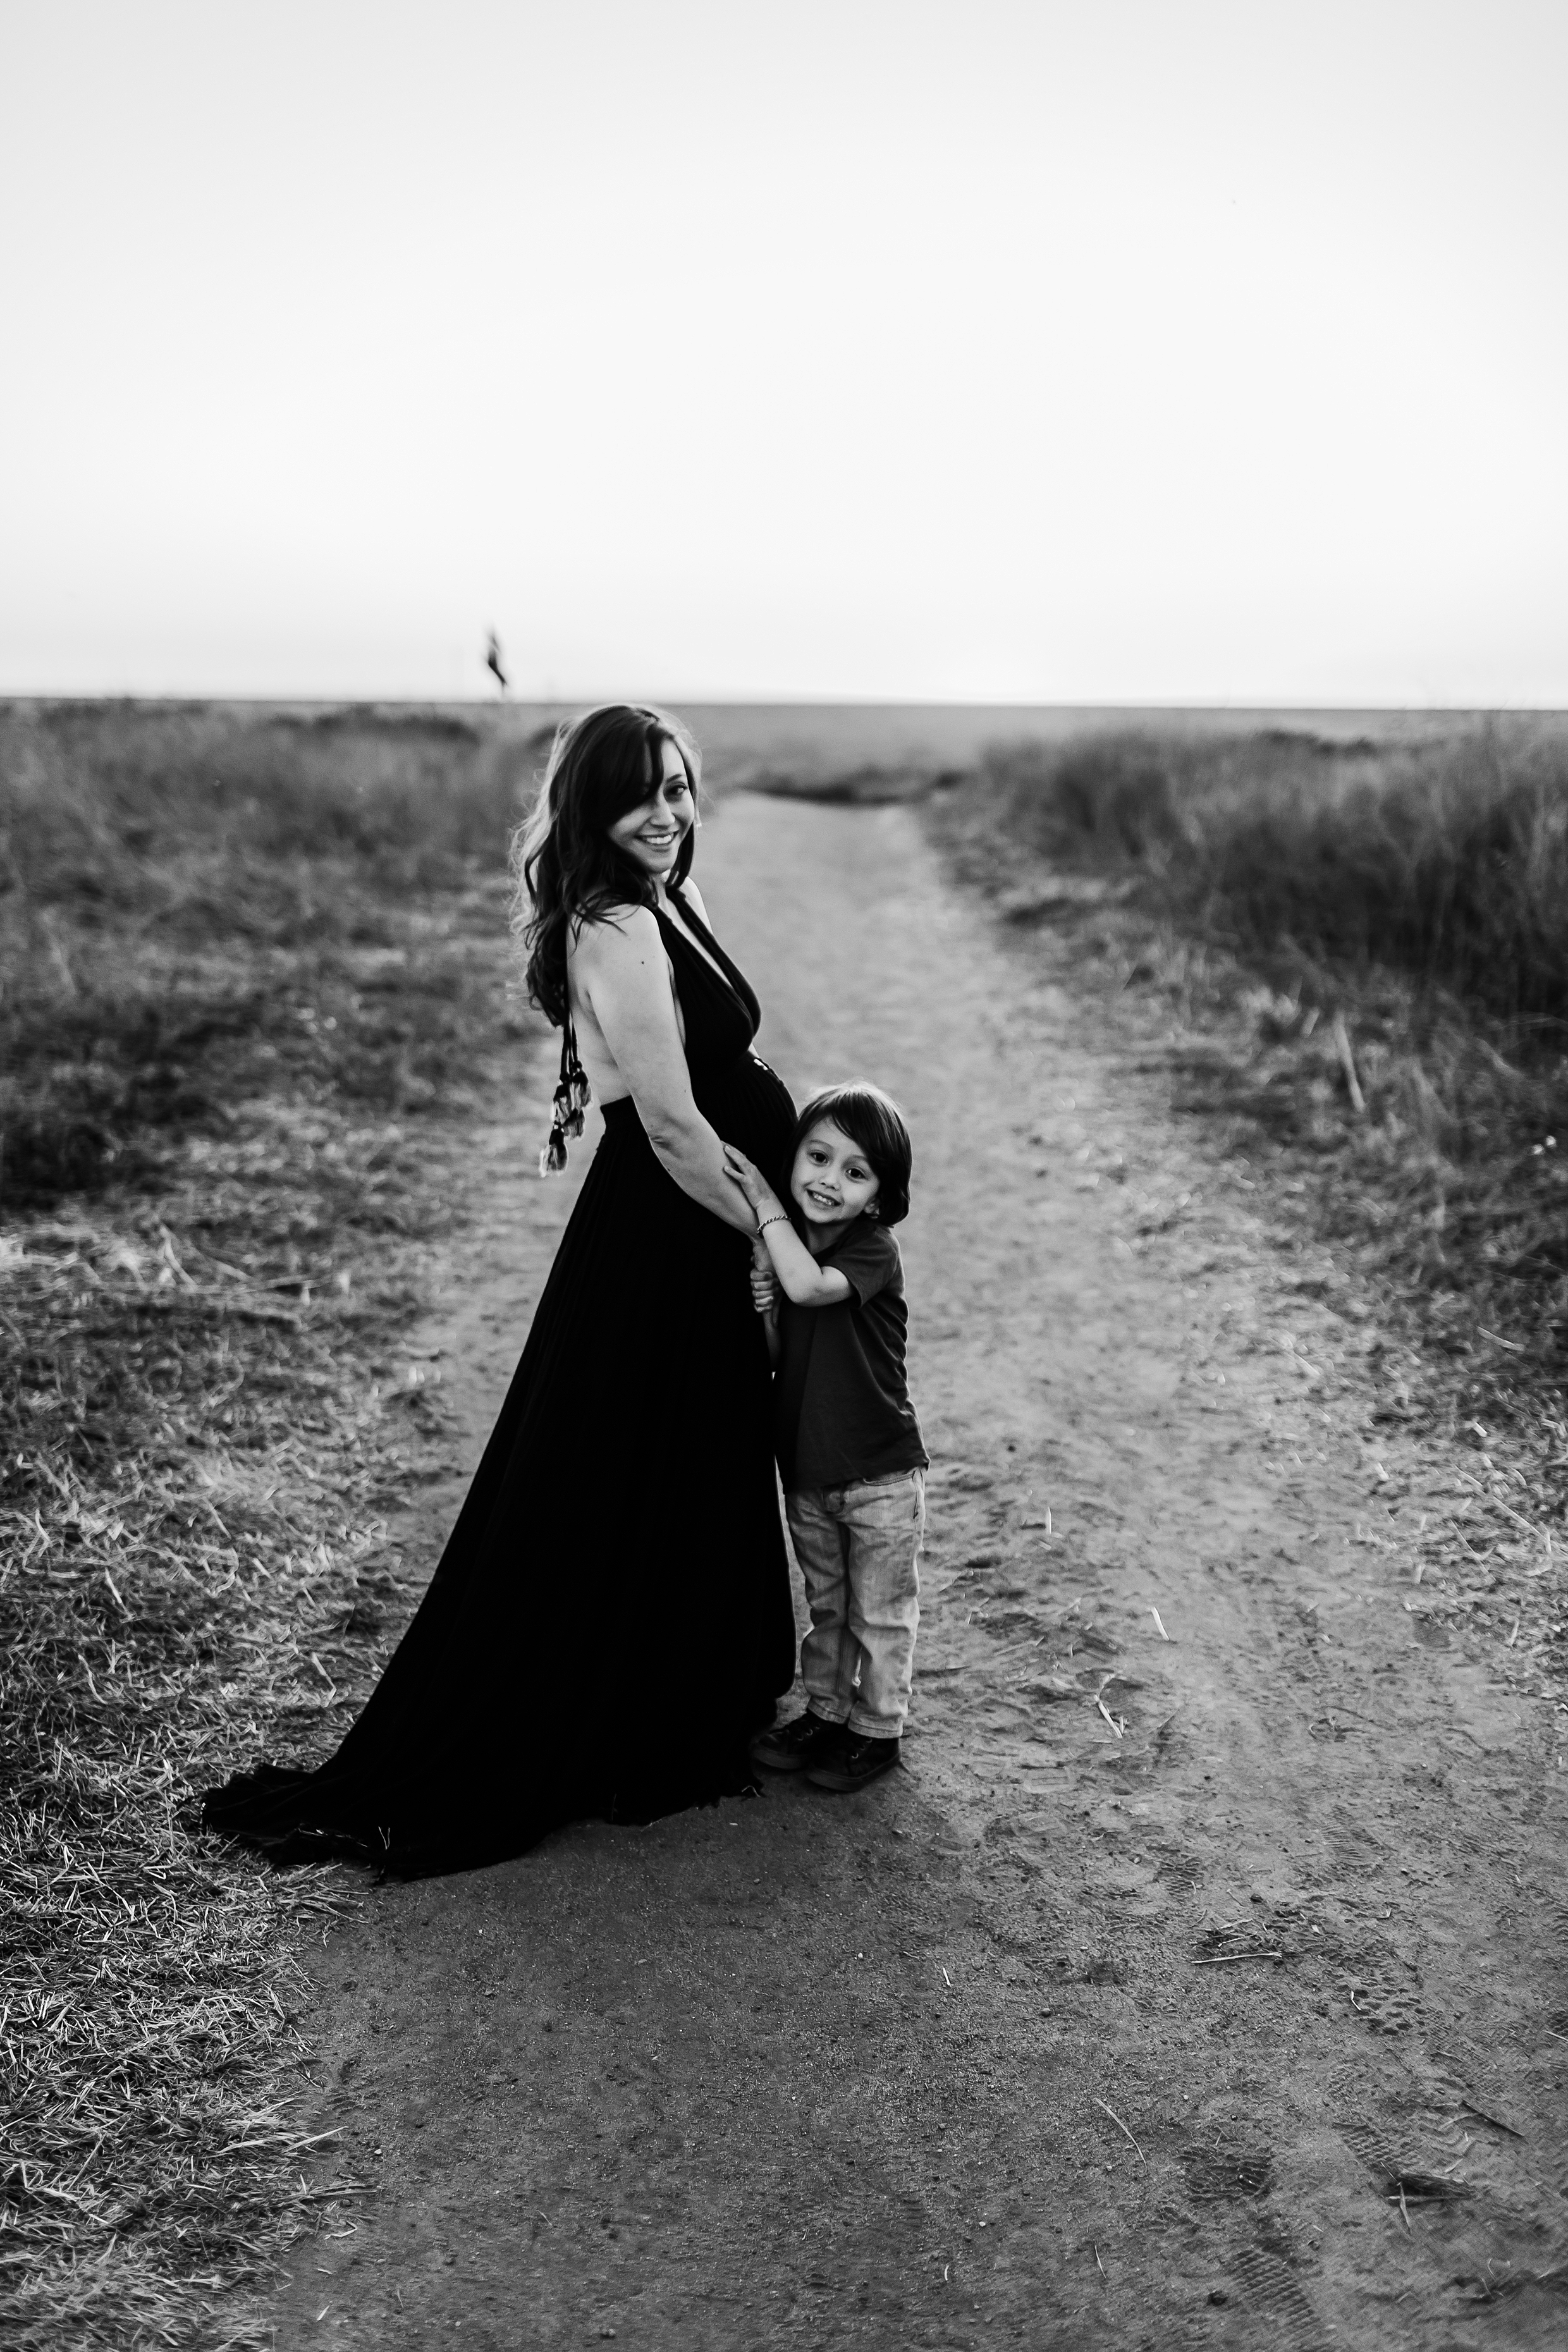 Bryanna-San-Antonio-Maternity-Photographer-107_WEB.jpg